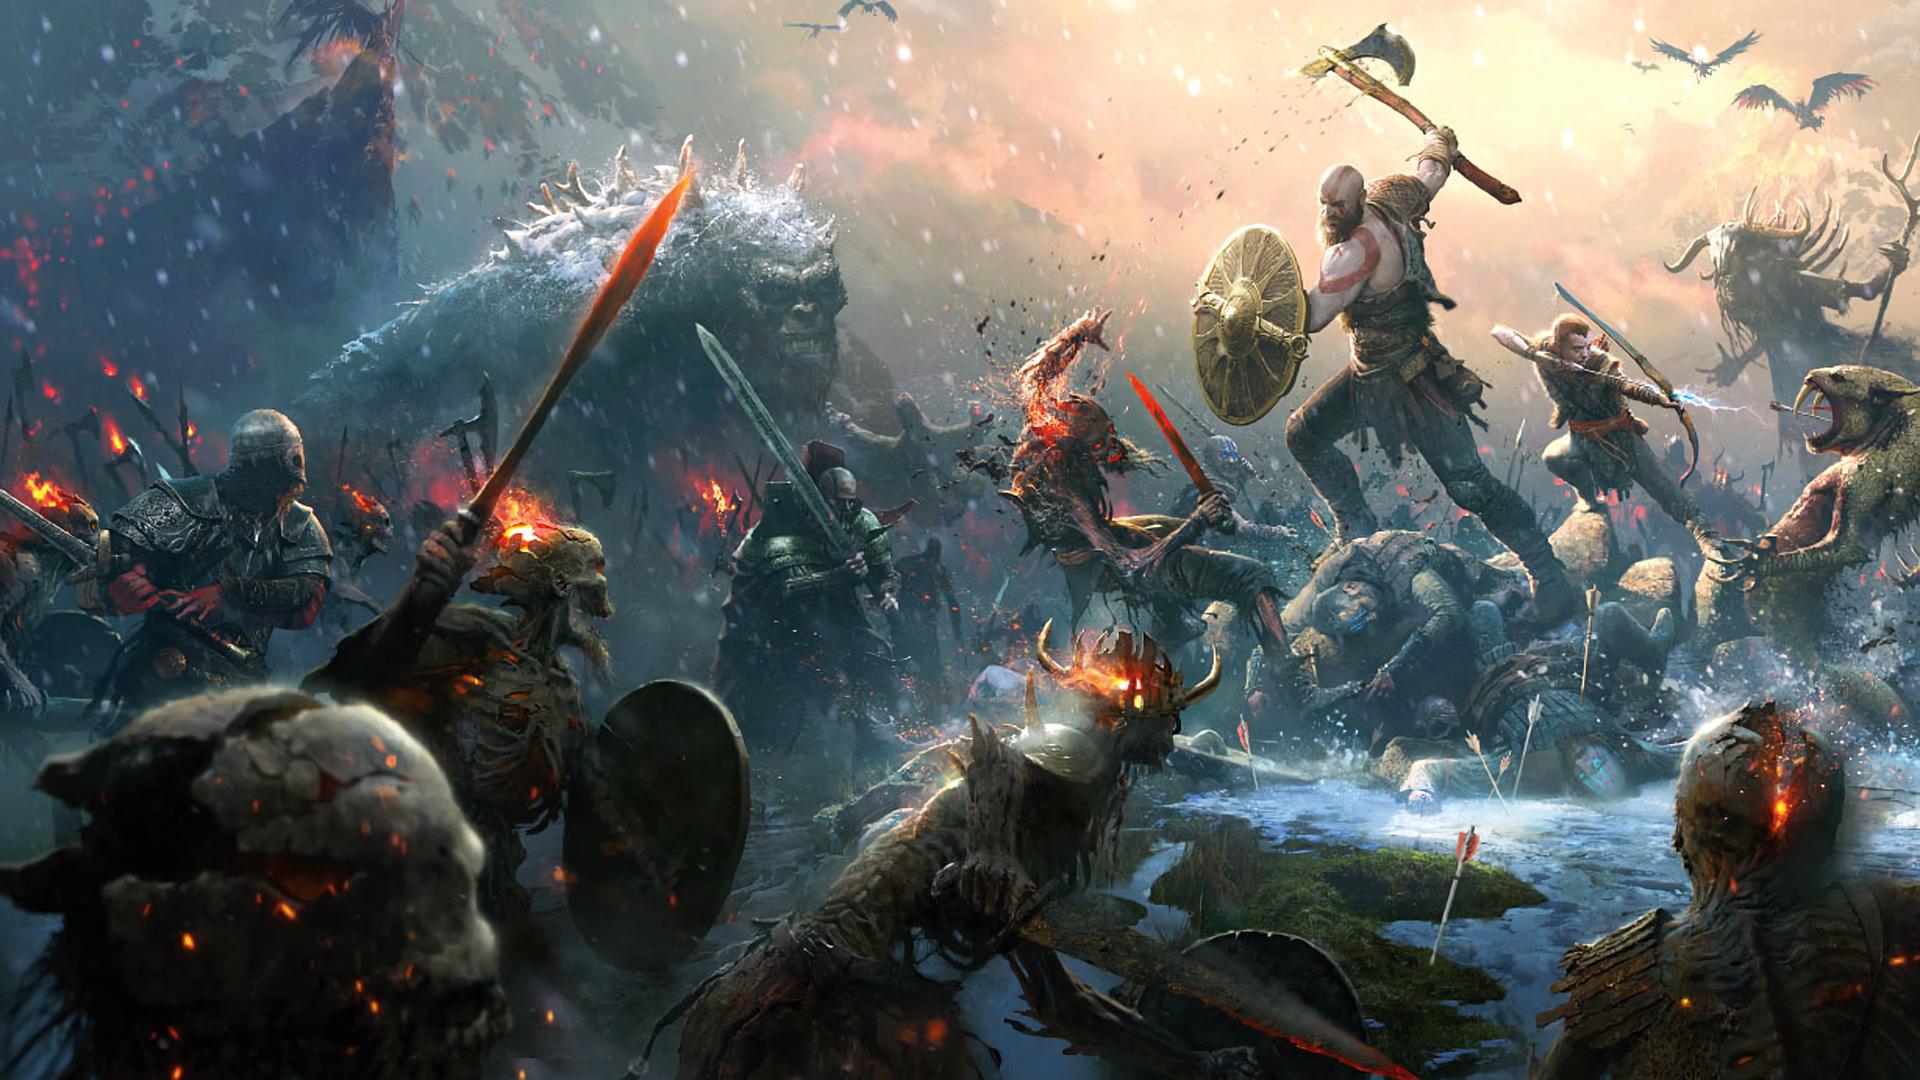 God of War (2018) HD Wallpaper.